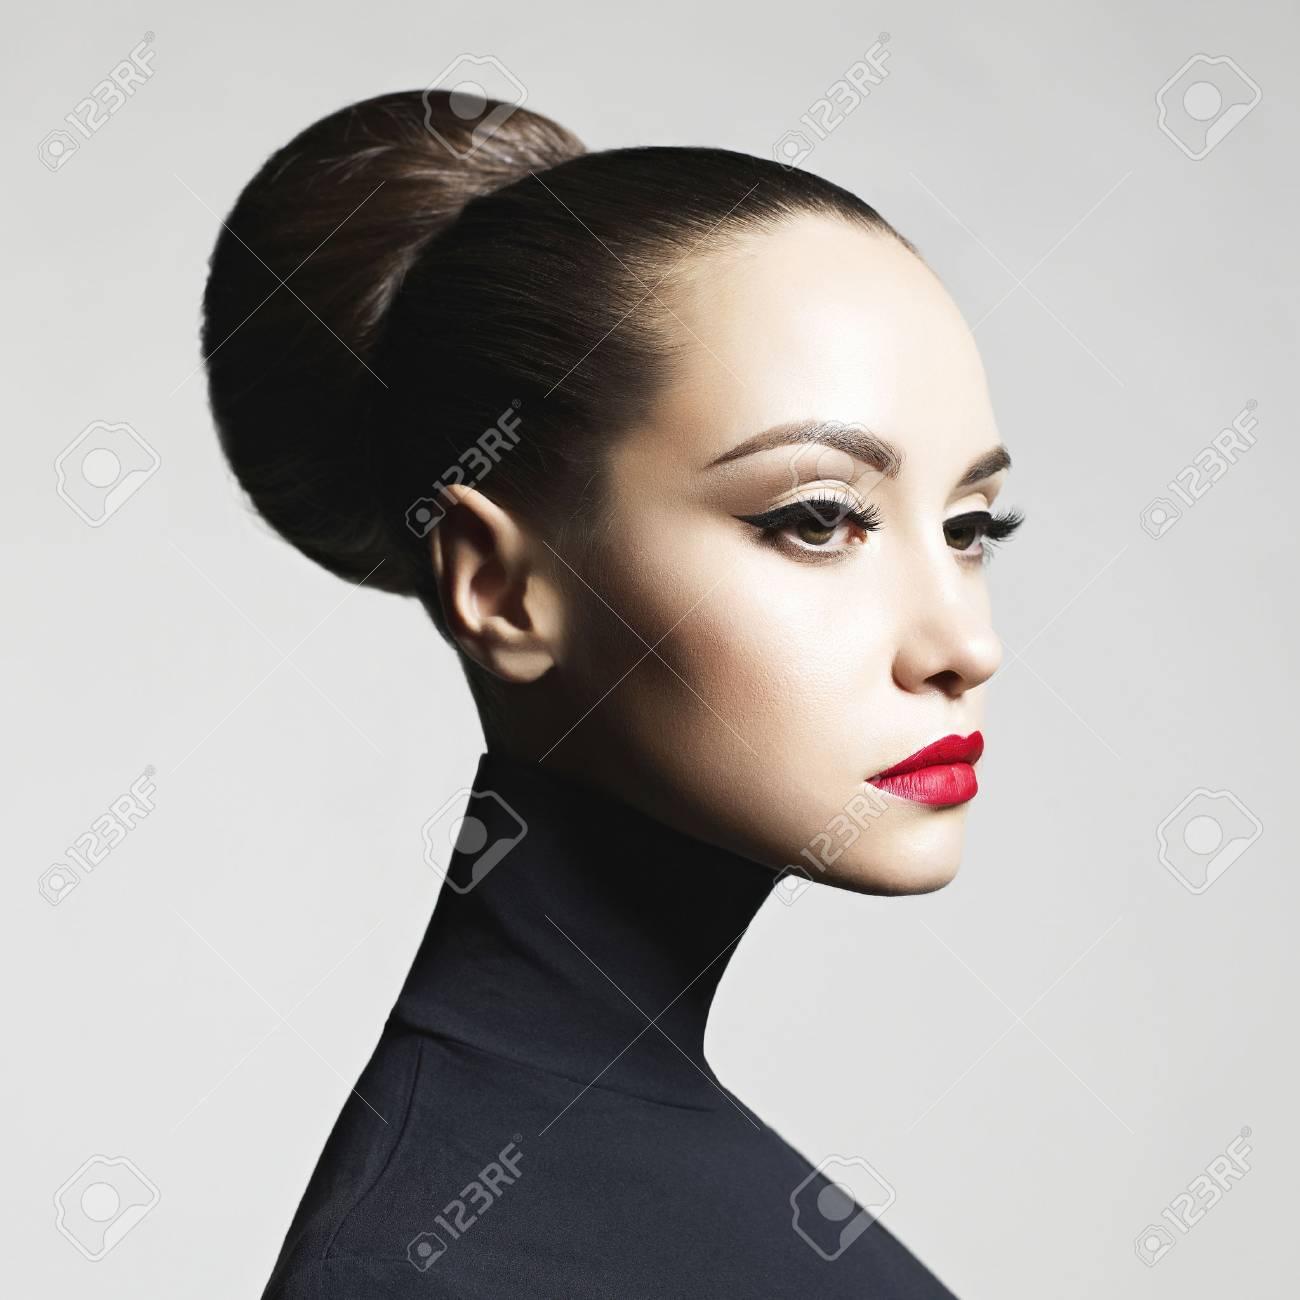 Fashion art studio portrait of beautiful elegant woman in black turtleneck. Hair is collected in high beam. Elegant ballet style - 91087166